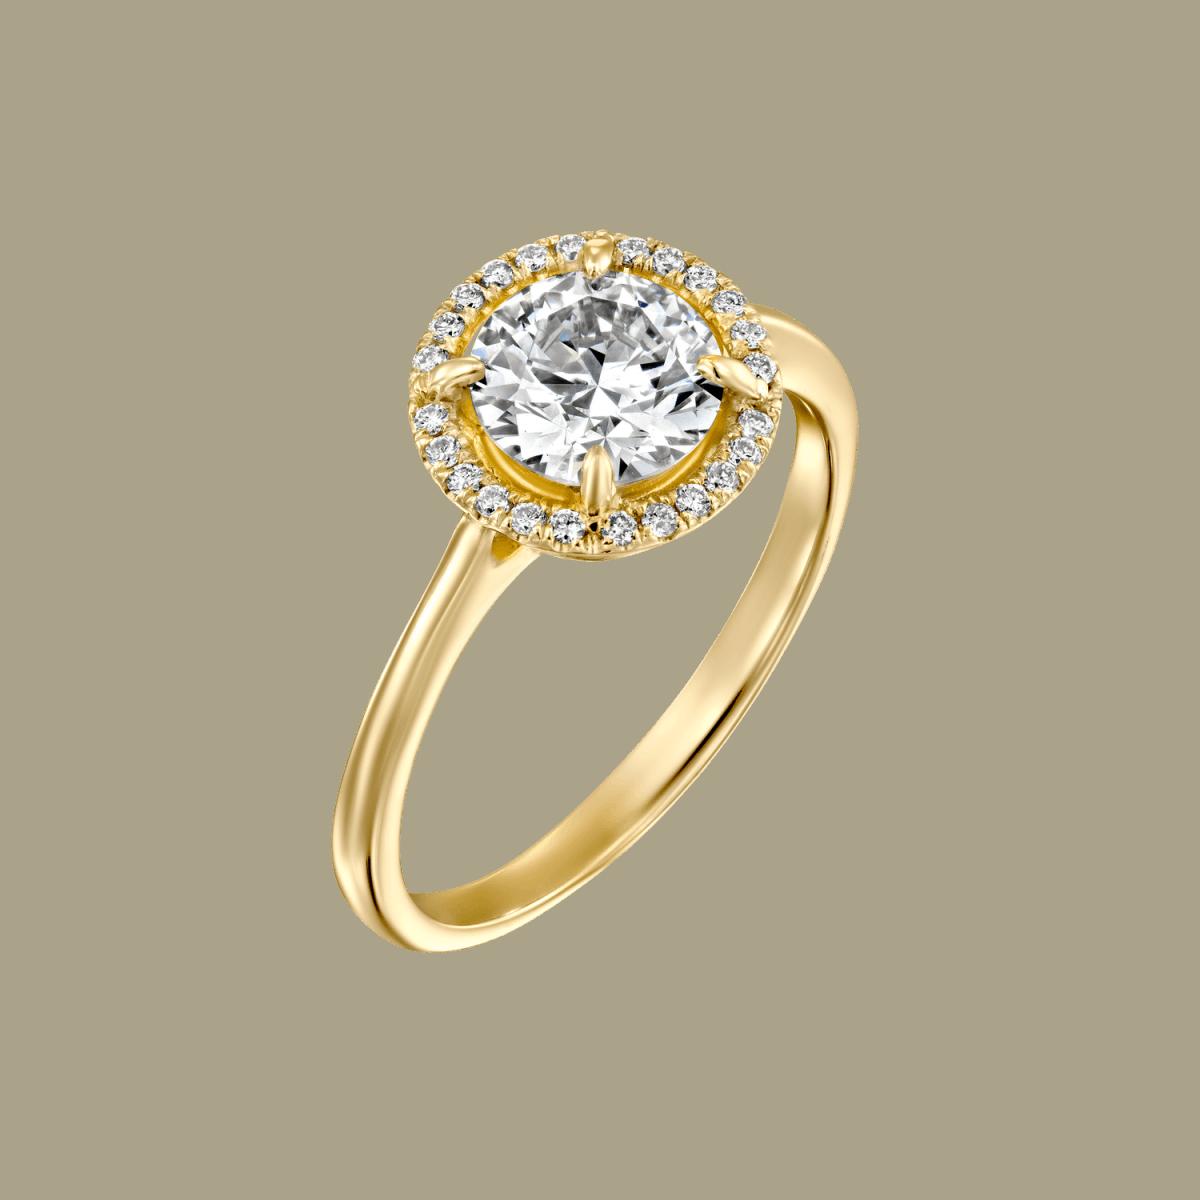 """Lisa"" - Yellow Gold Lab Grown Diamond Engagement Ring 1.31ct. - main"